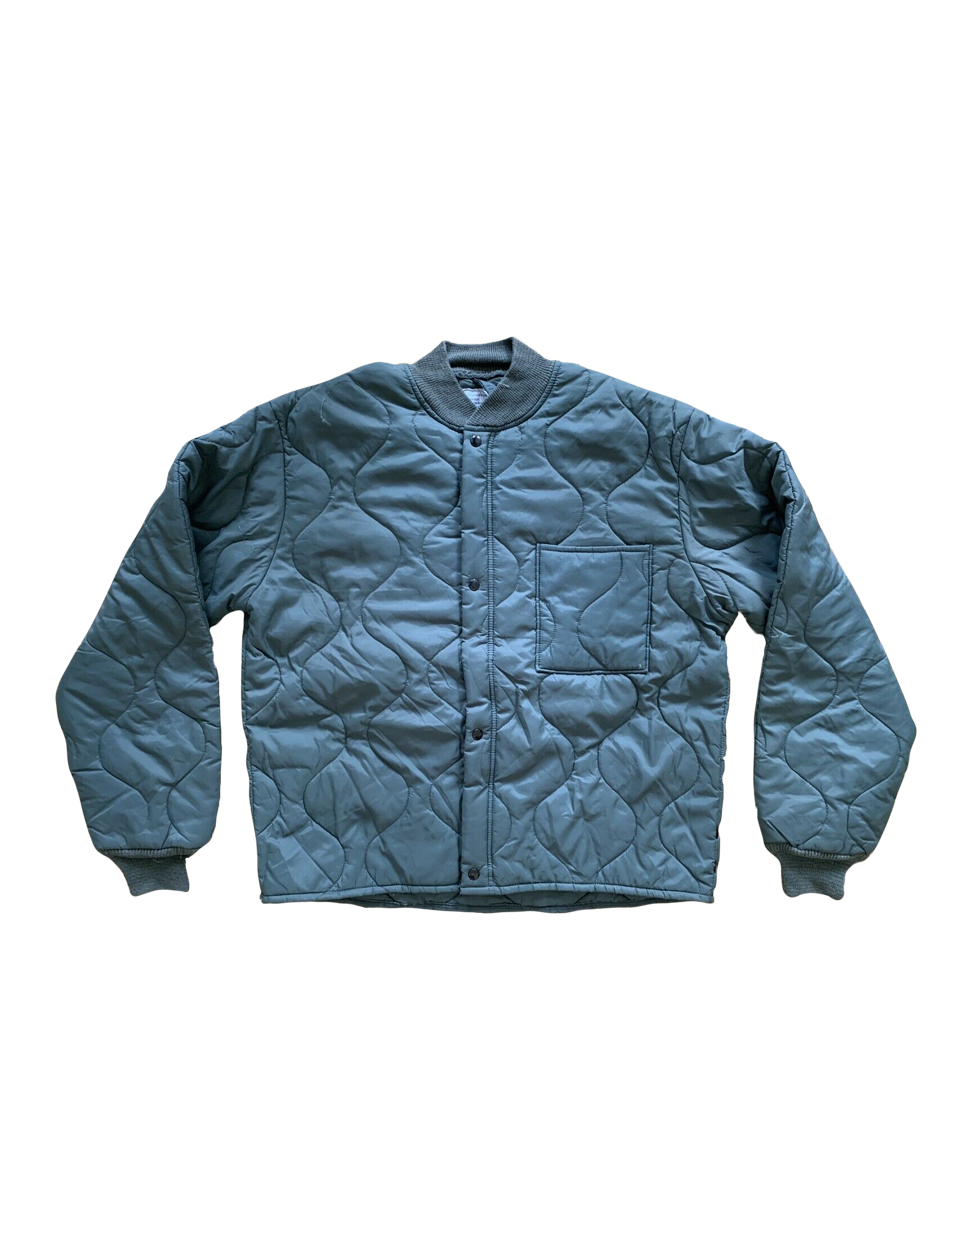 vintage military flight jacket liner